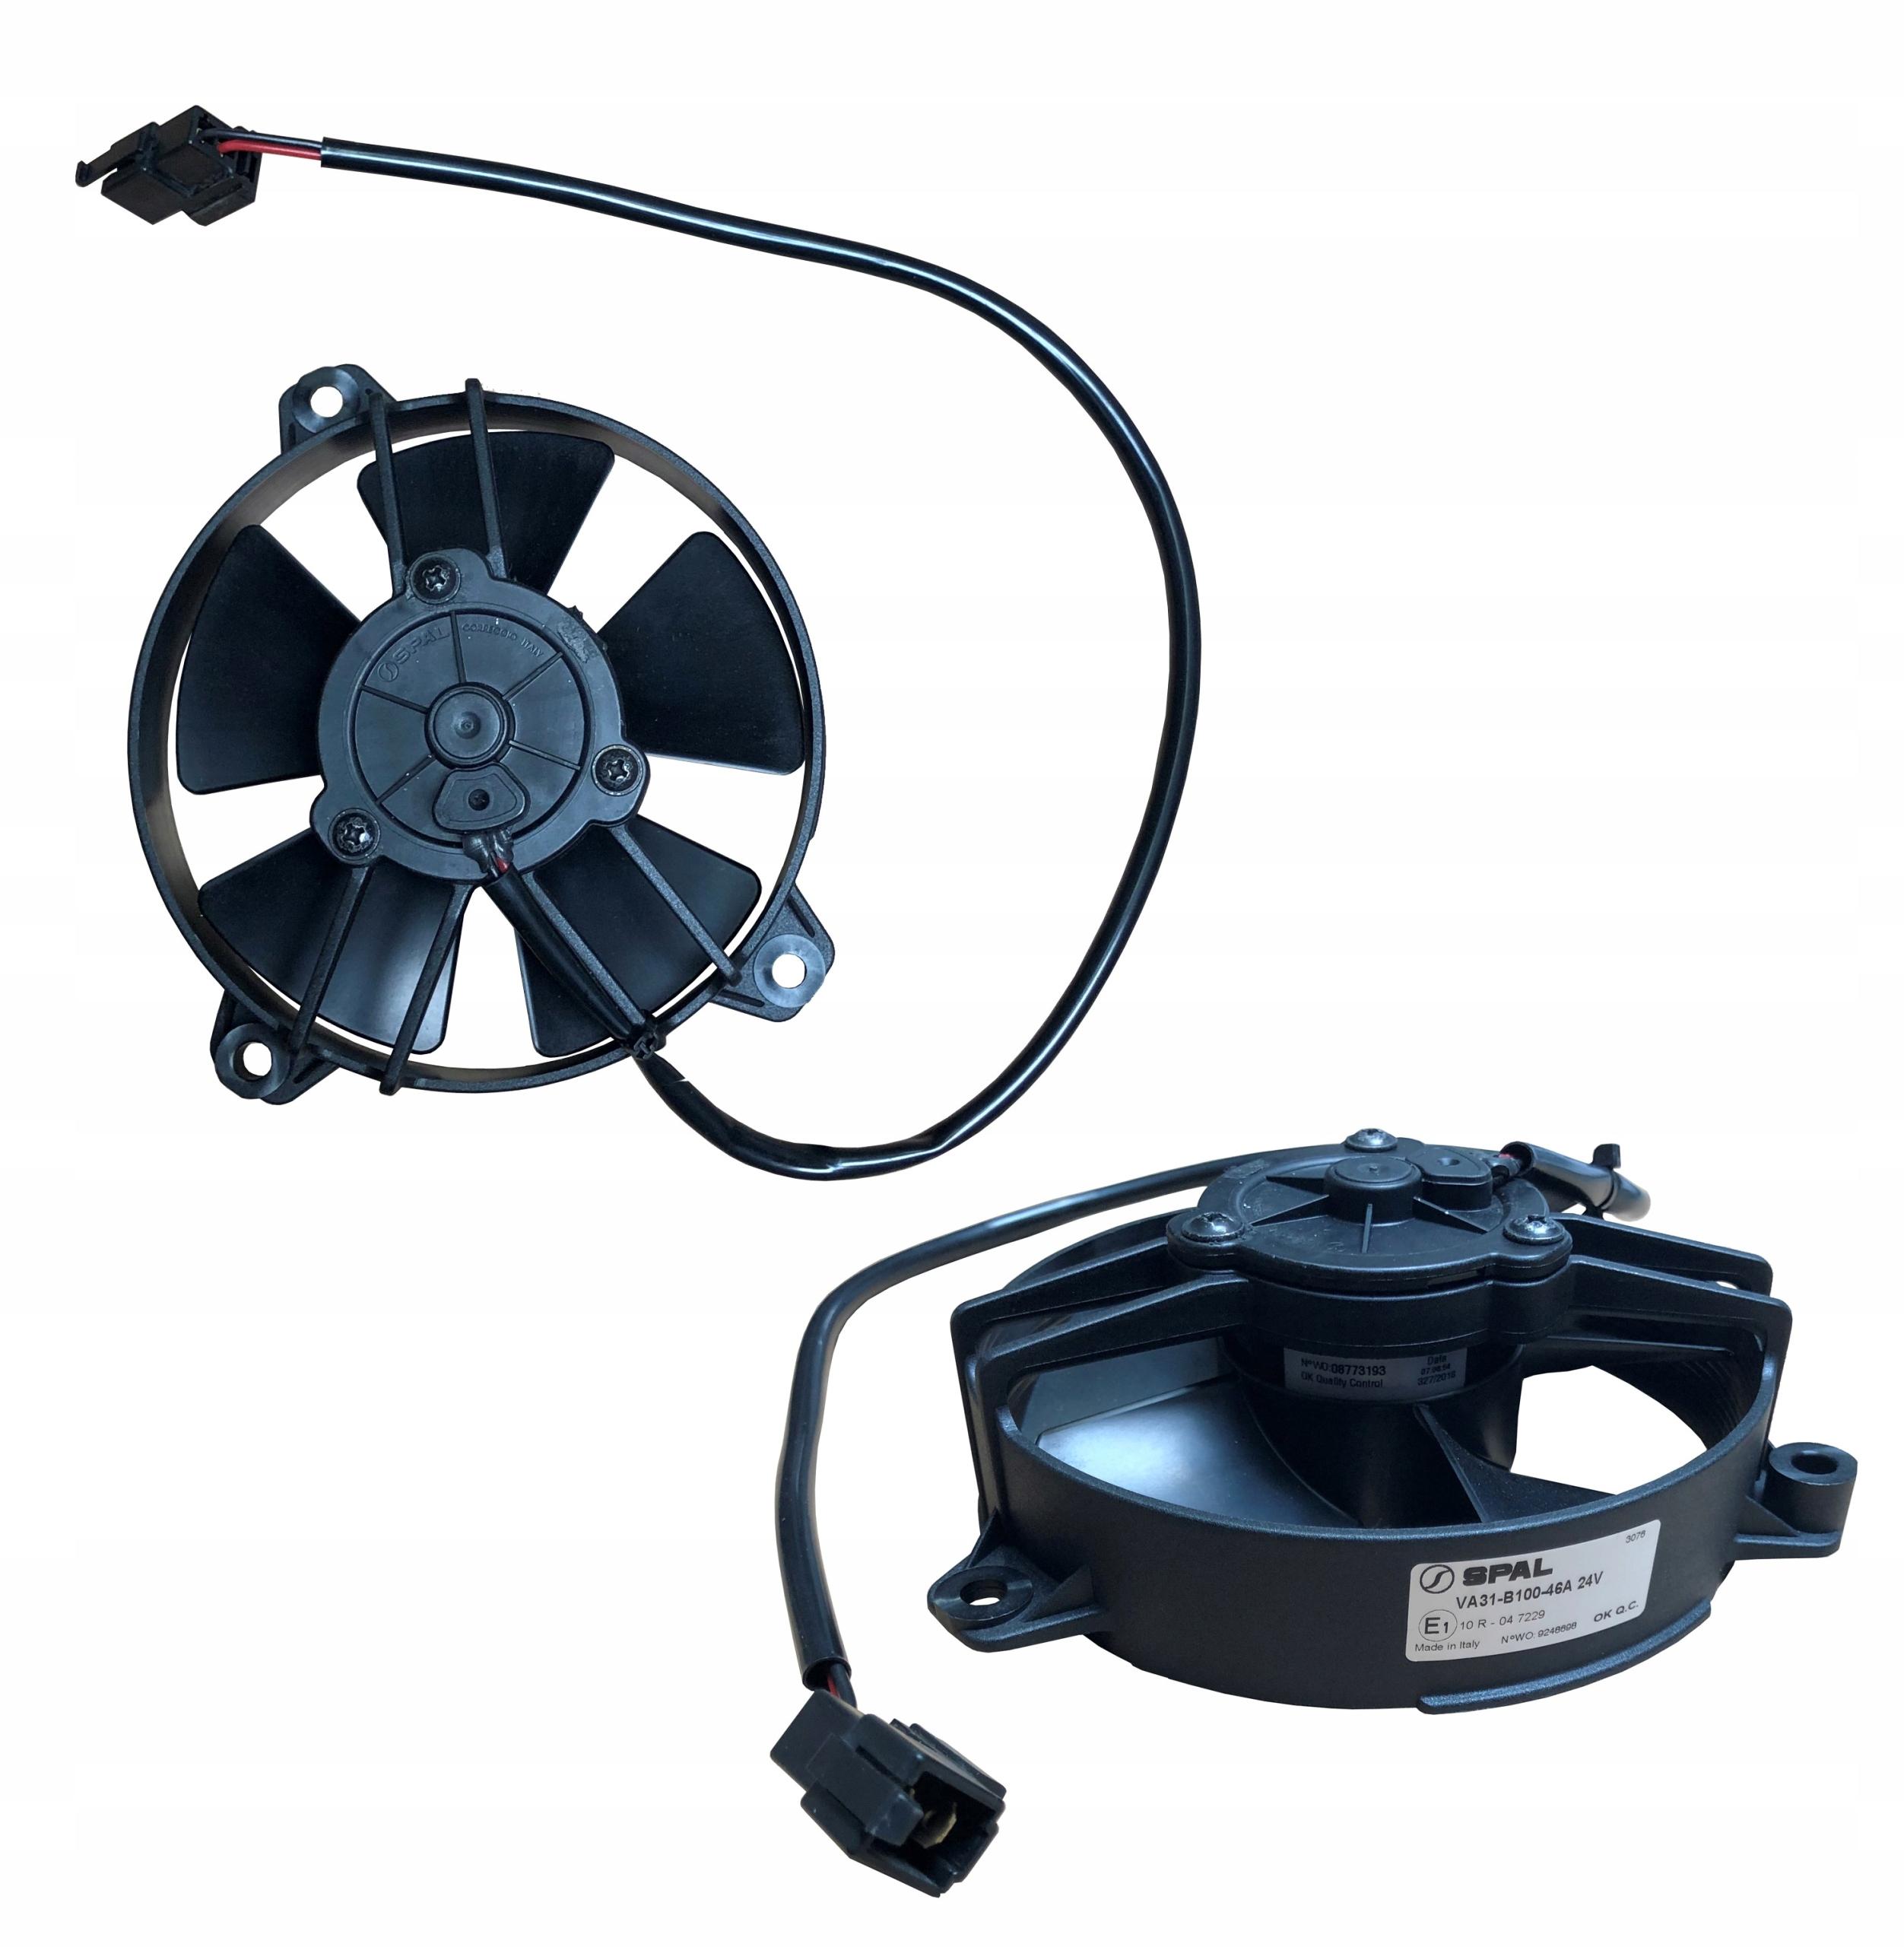 вентилятор сожги 24v va31-b100-46a всасывающий 130mm